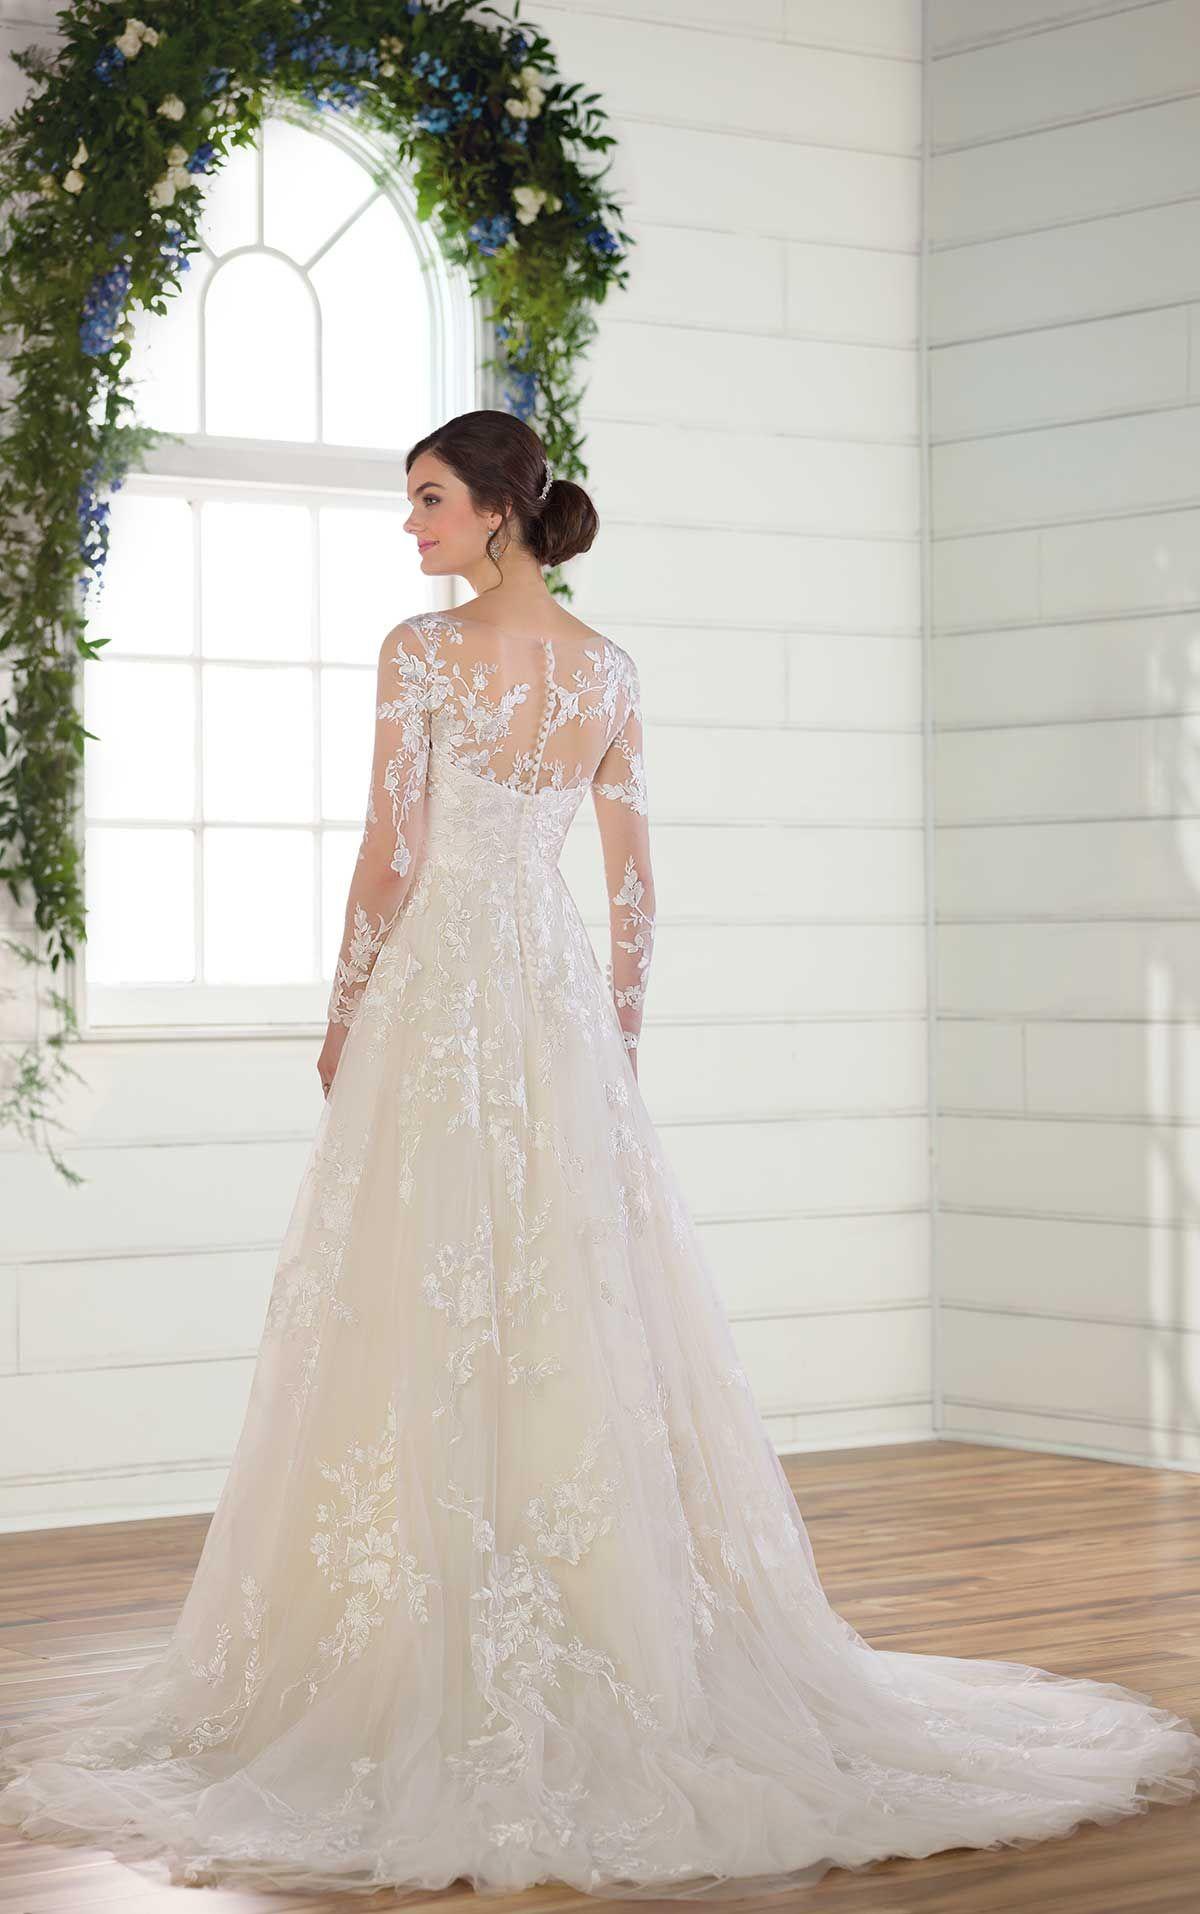 My Dress Modest Wedding With Sleeves Essense Of Australia